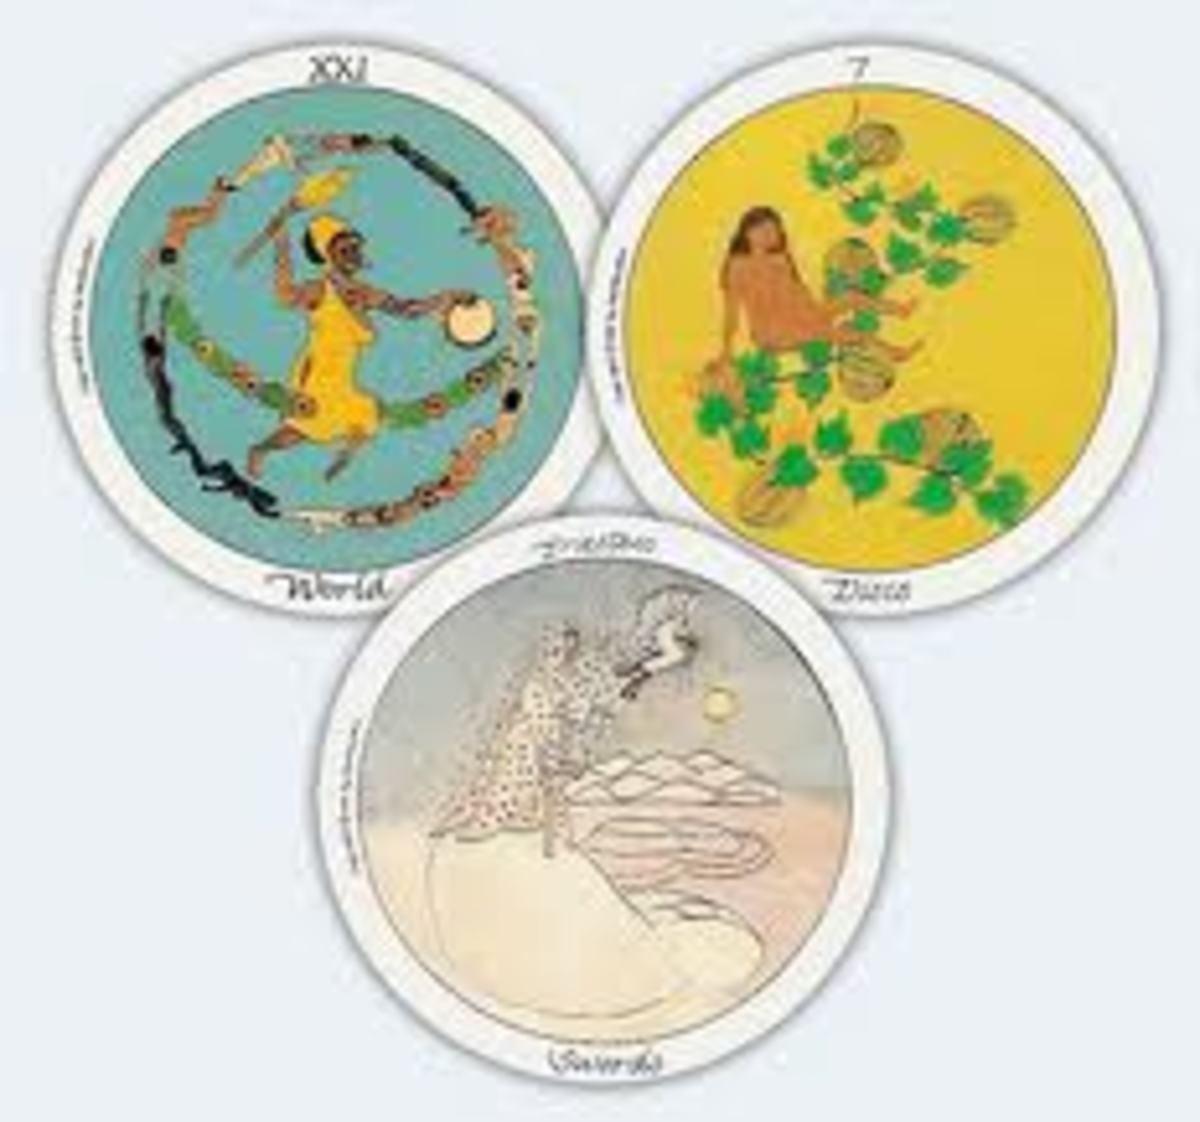 tarot-cards-and-readings-three-card-spread